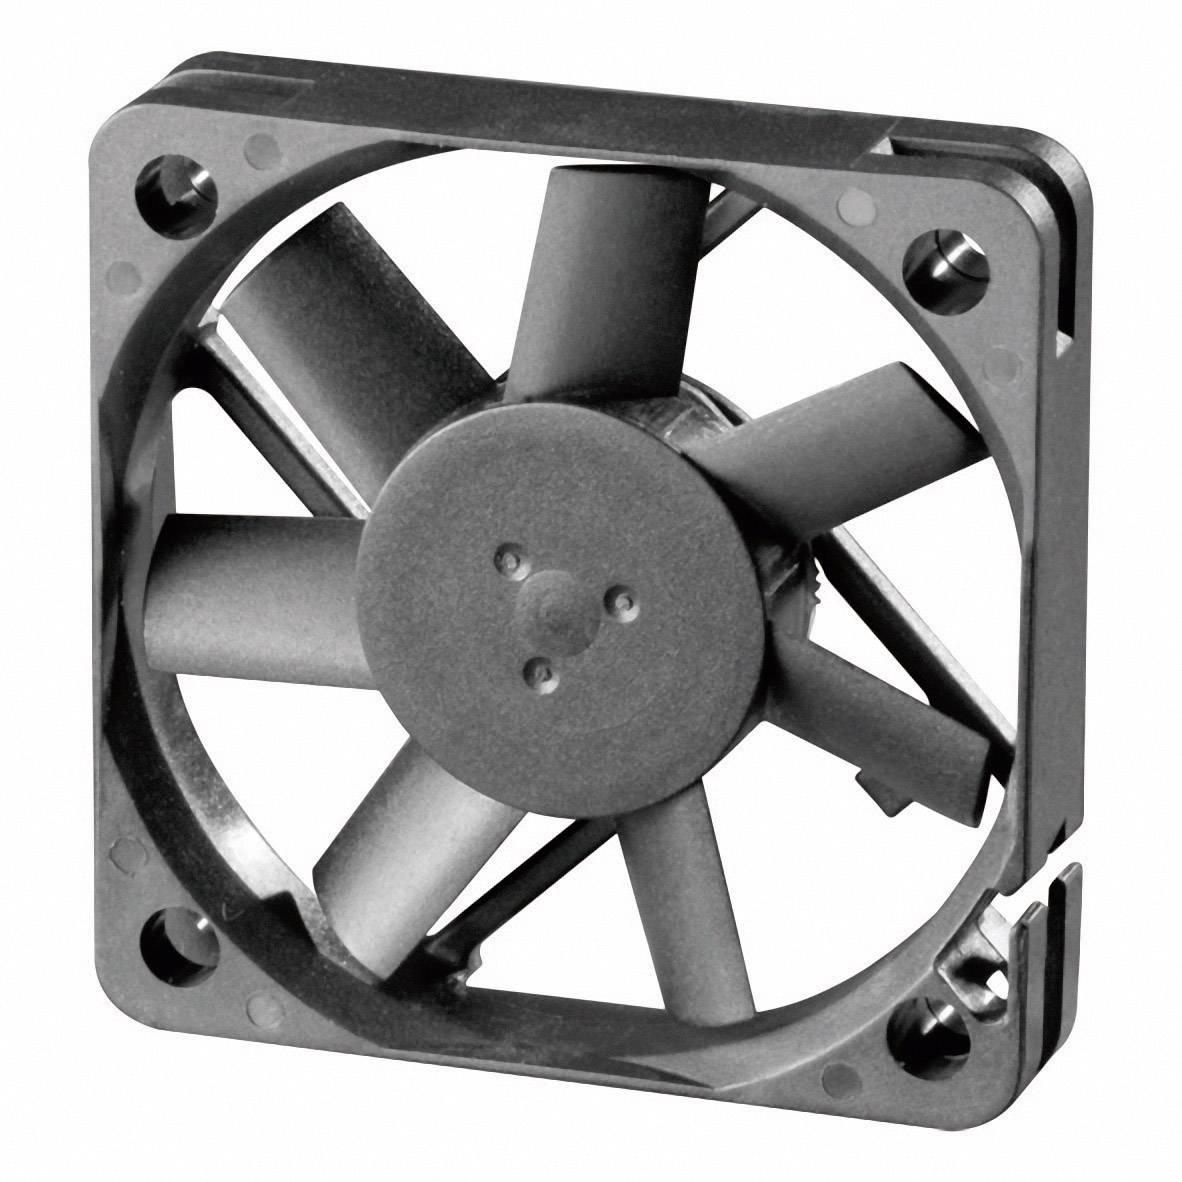 Axiálny ventilátor Sunon EB60201S1-000U-999 EB60201S1-000U-999, 12 V/DC, 33.5 dB, (d x š x v) 60 x 60 x 20 mm